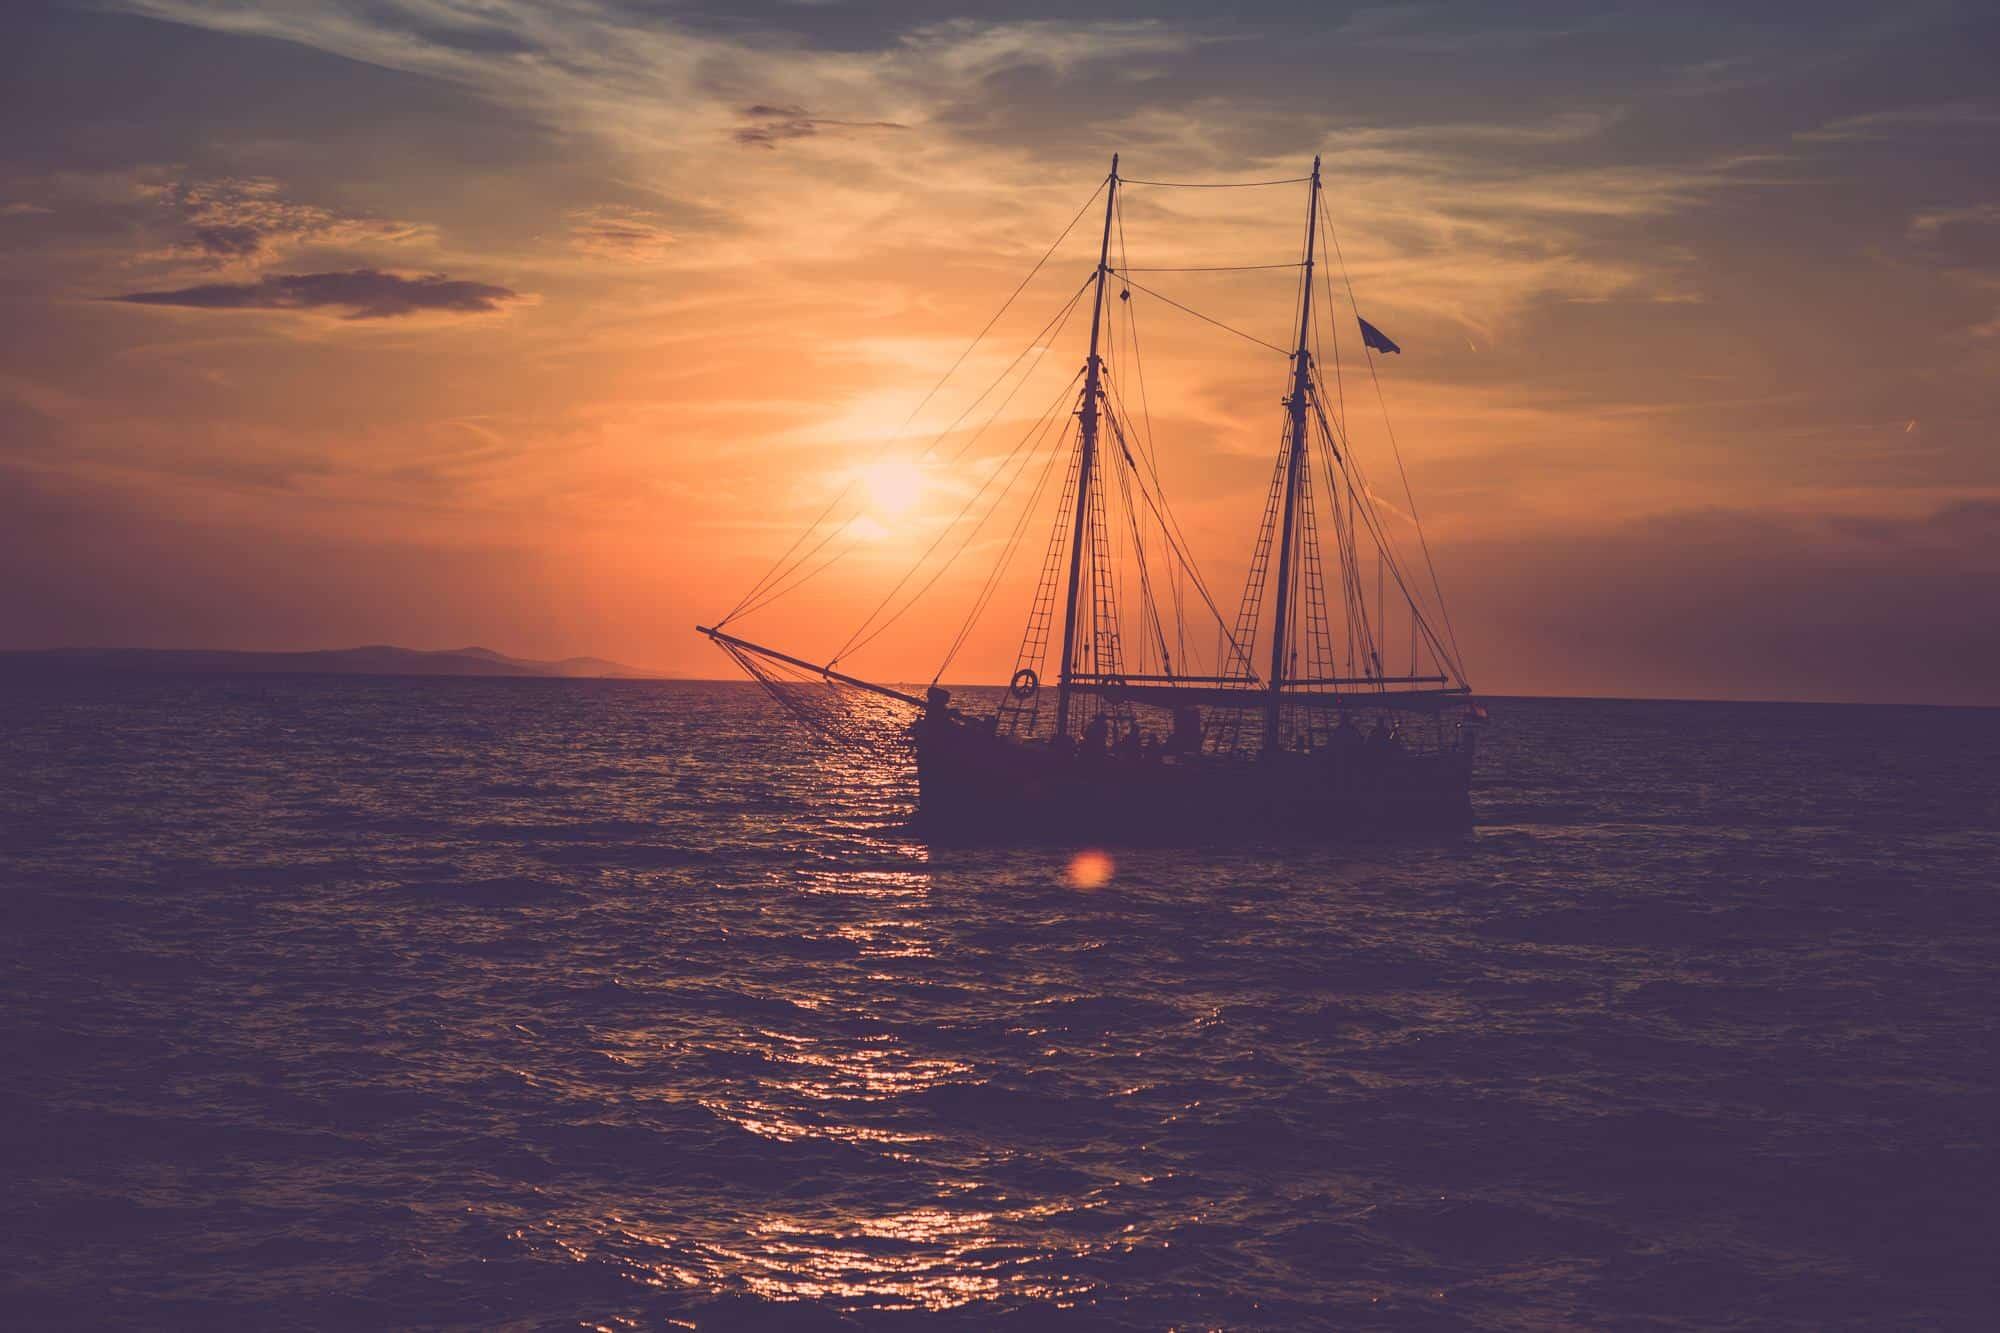 2018 Soundwave Boat Parties (Credit: Jane Anderson)